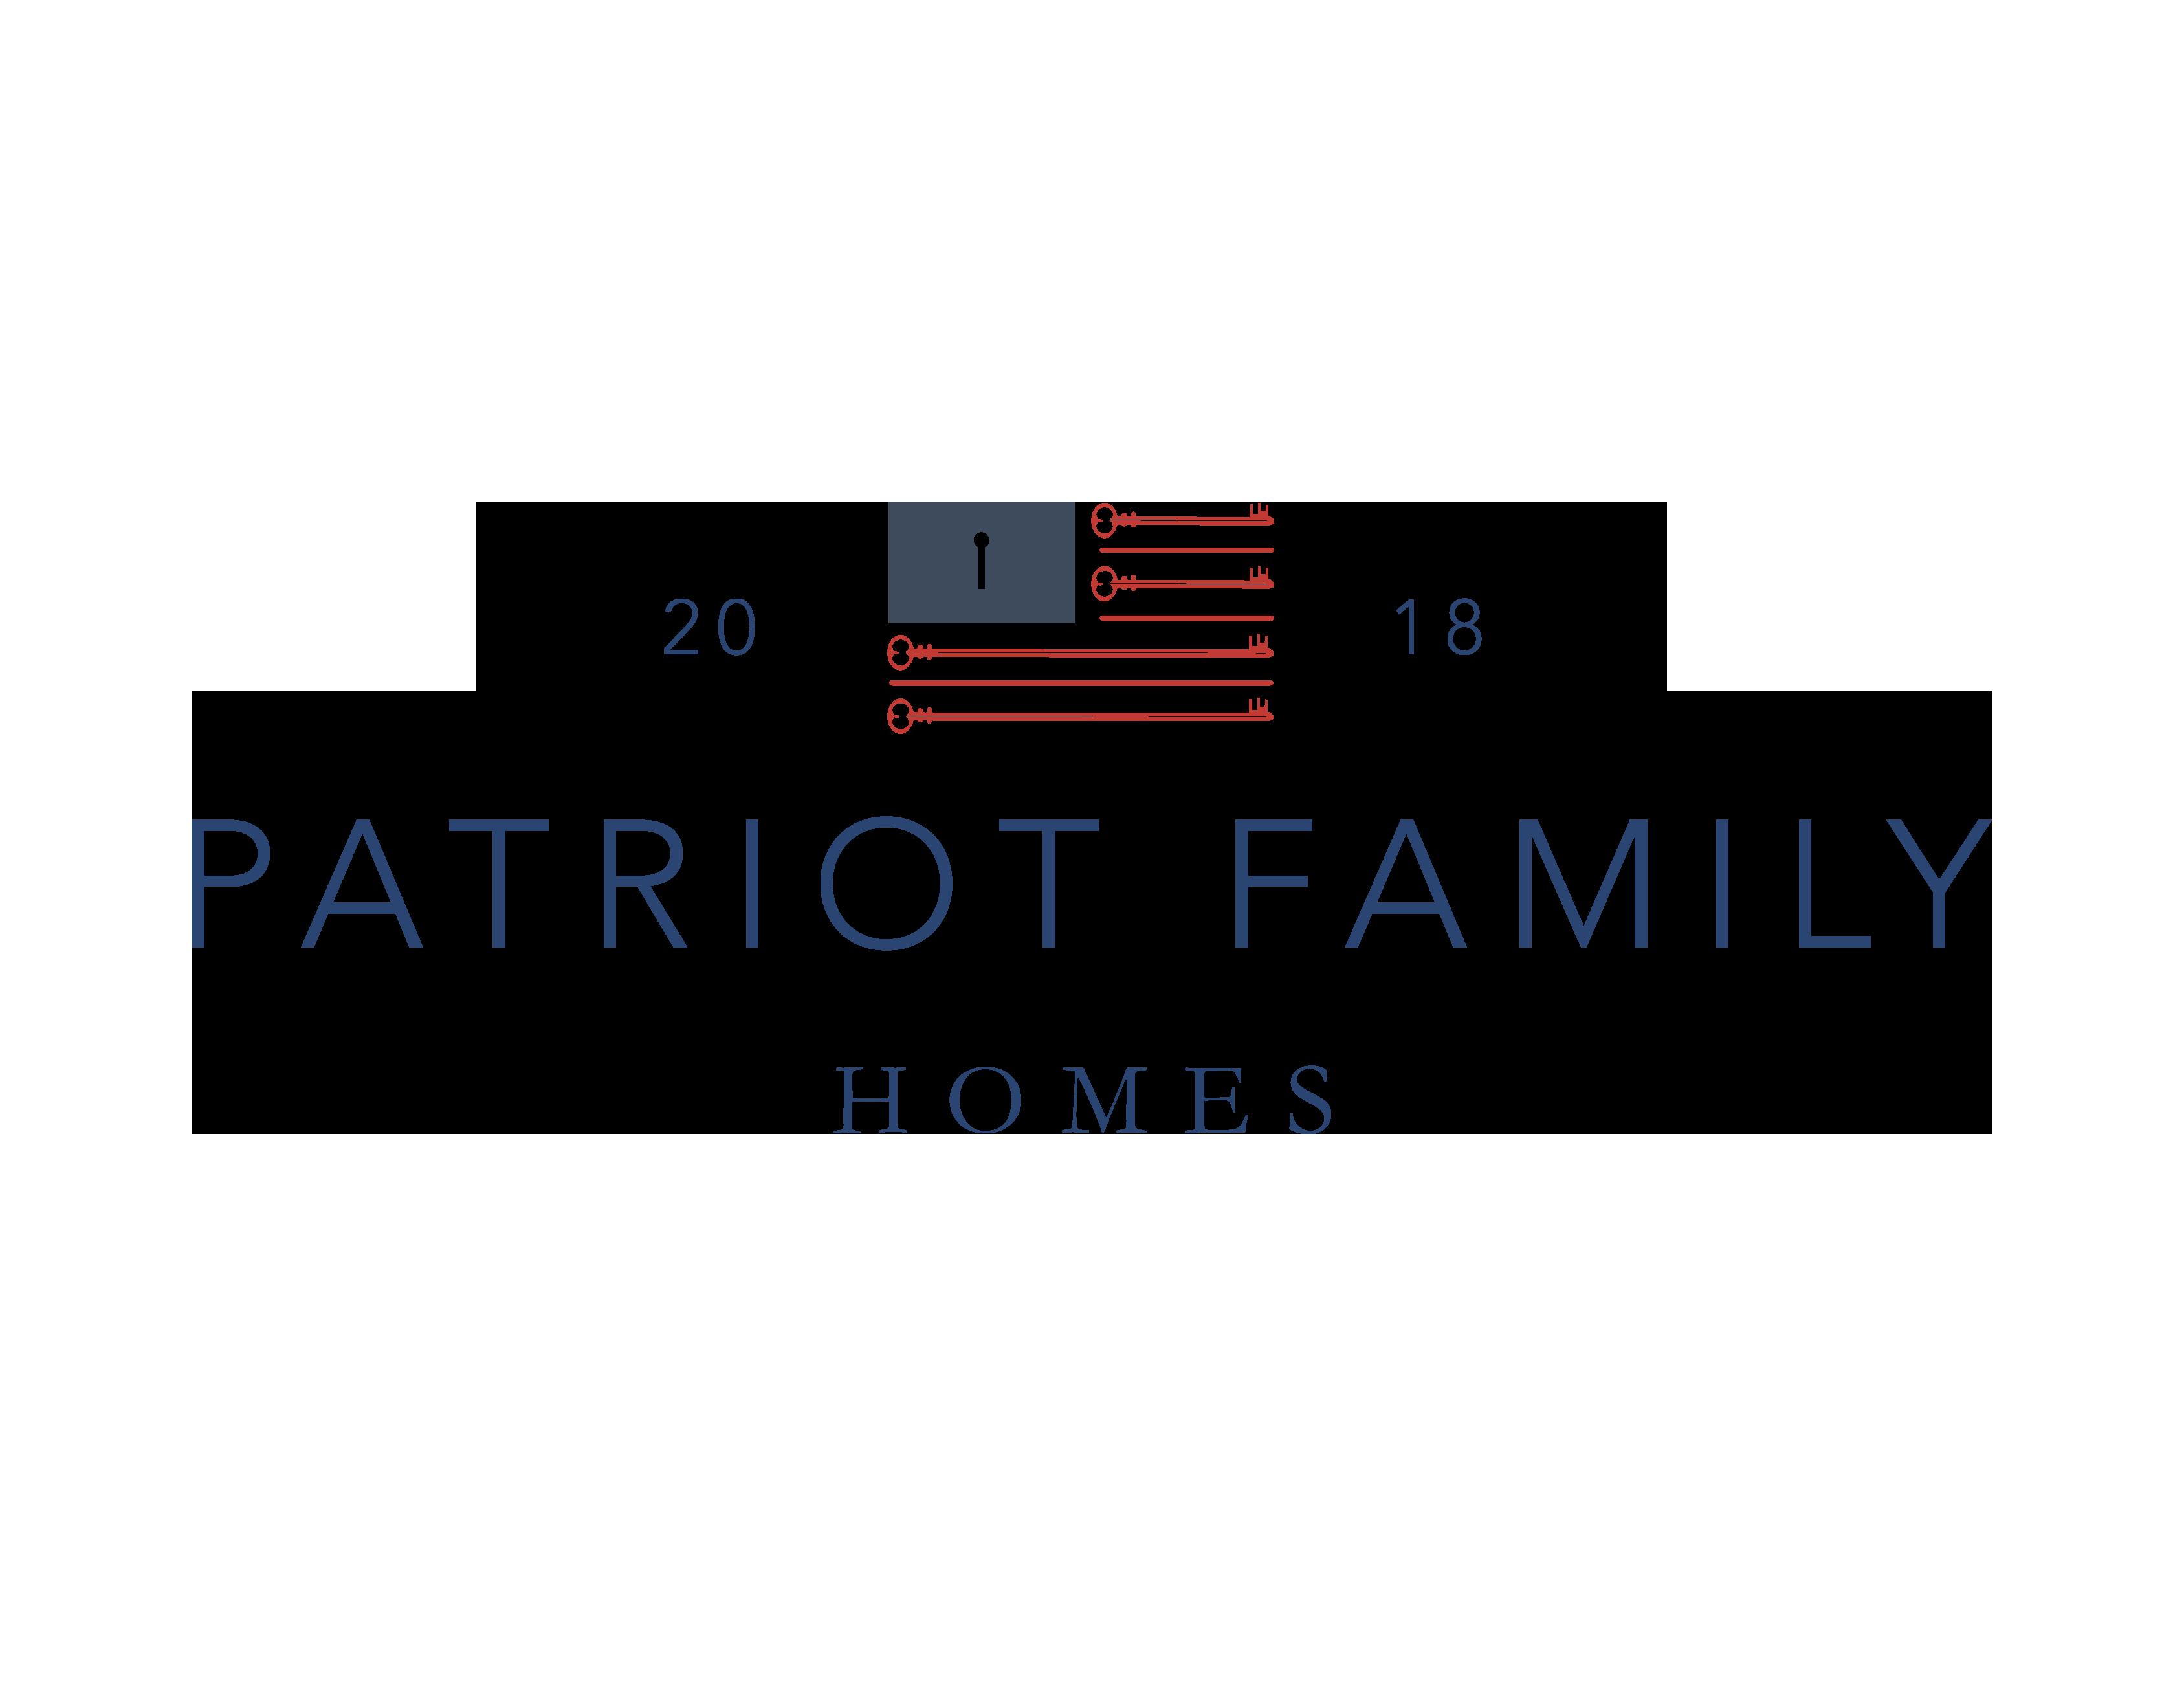 Patriot Family Homes